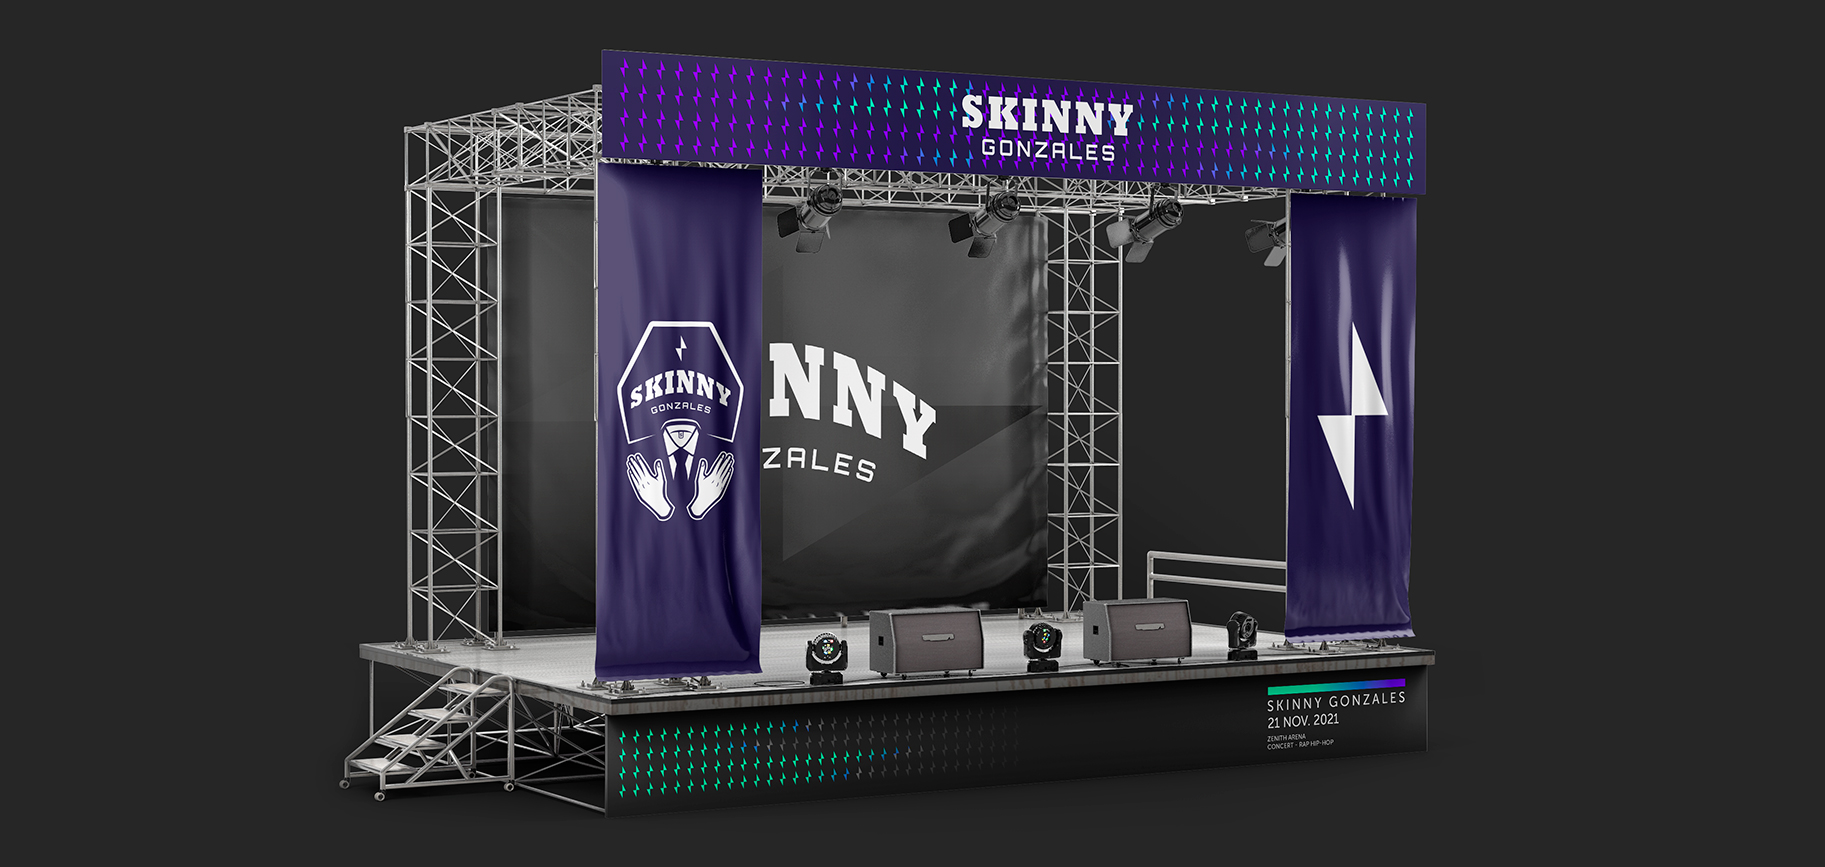 Skinny-stage